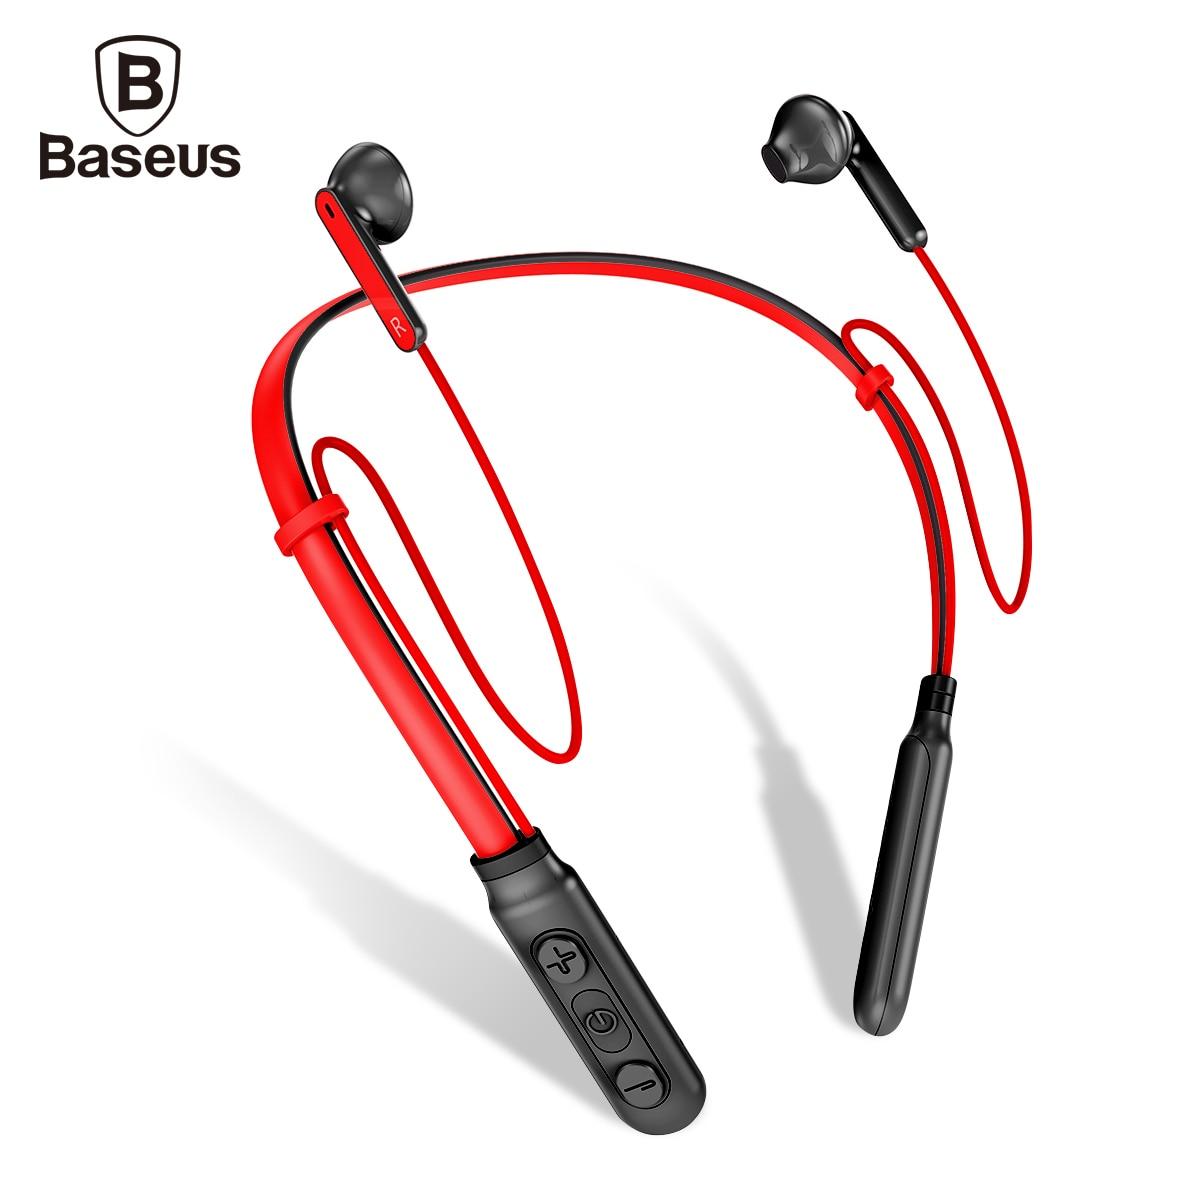 Baseus S16 Wireless Headphone Bluetooth Earphone Fone De Ouvido For Mobile Phone Neckband Ecounter Auriculares V4.0 bluetooth earphone headphone for iphone samsung xiaomi fone de ouvido qkz qg8 bluetooth headset sport wireless hifi music stereo